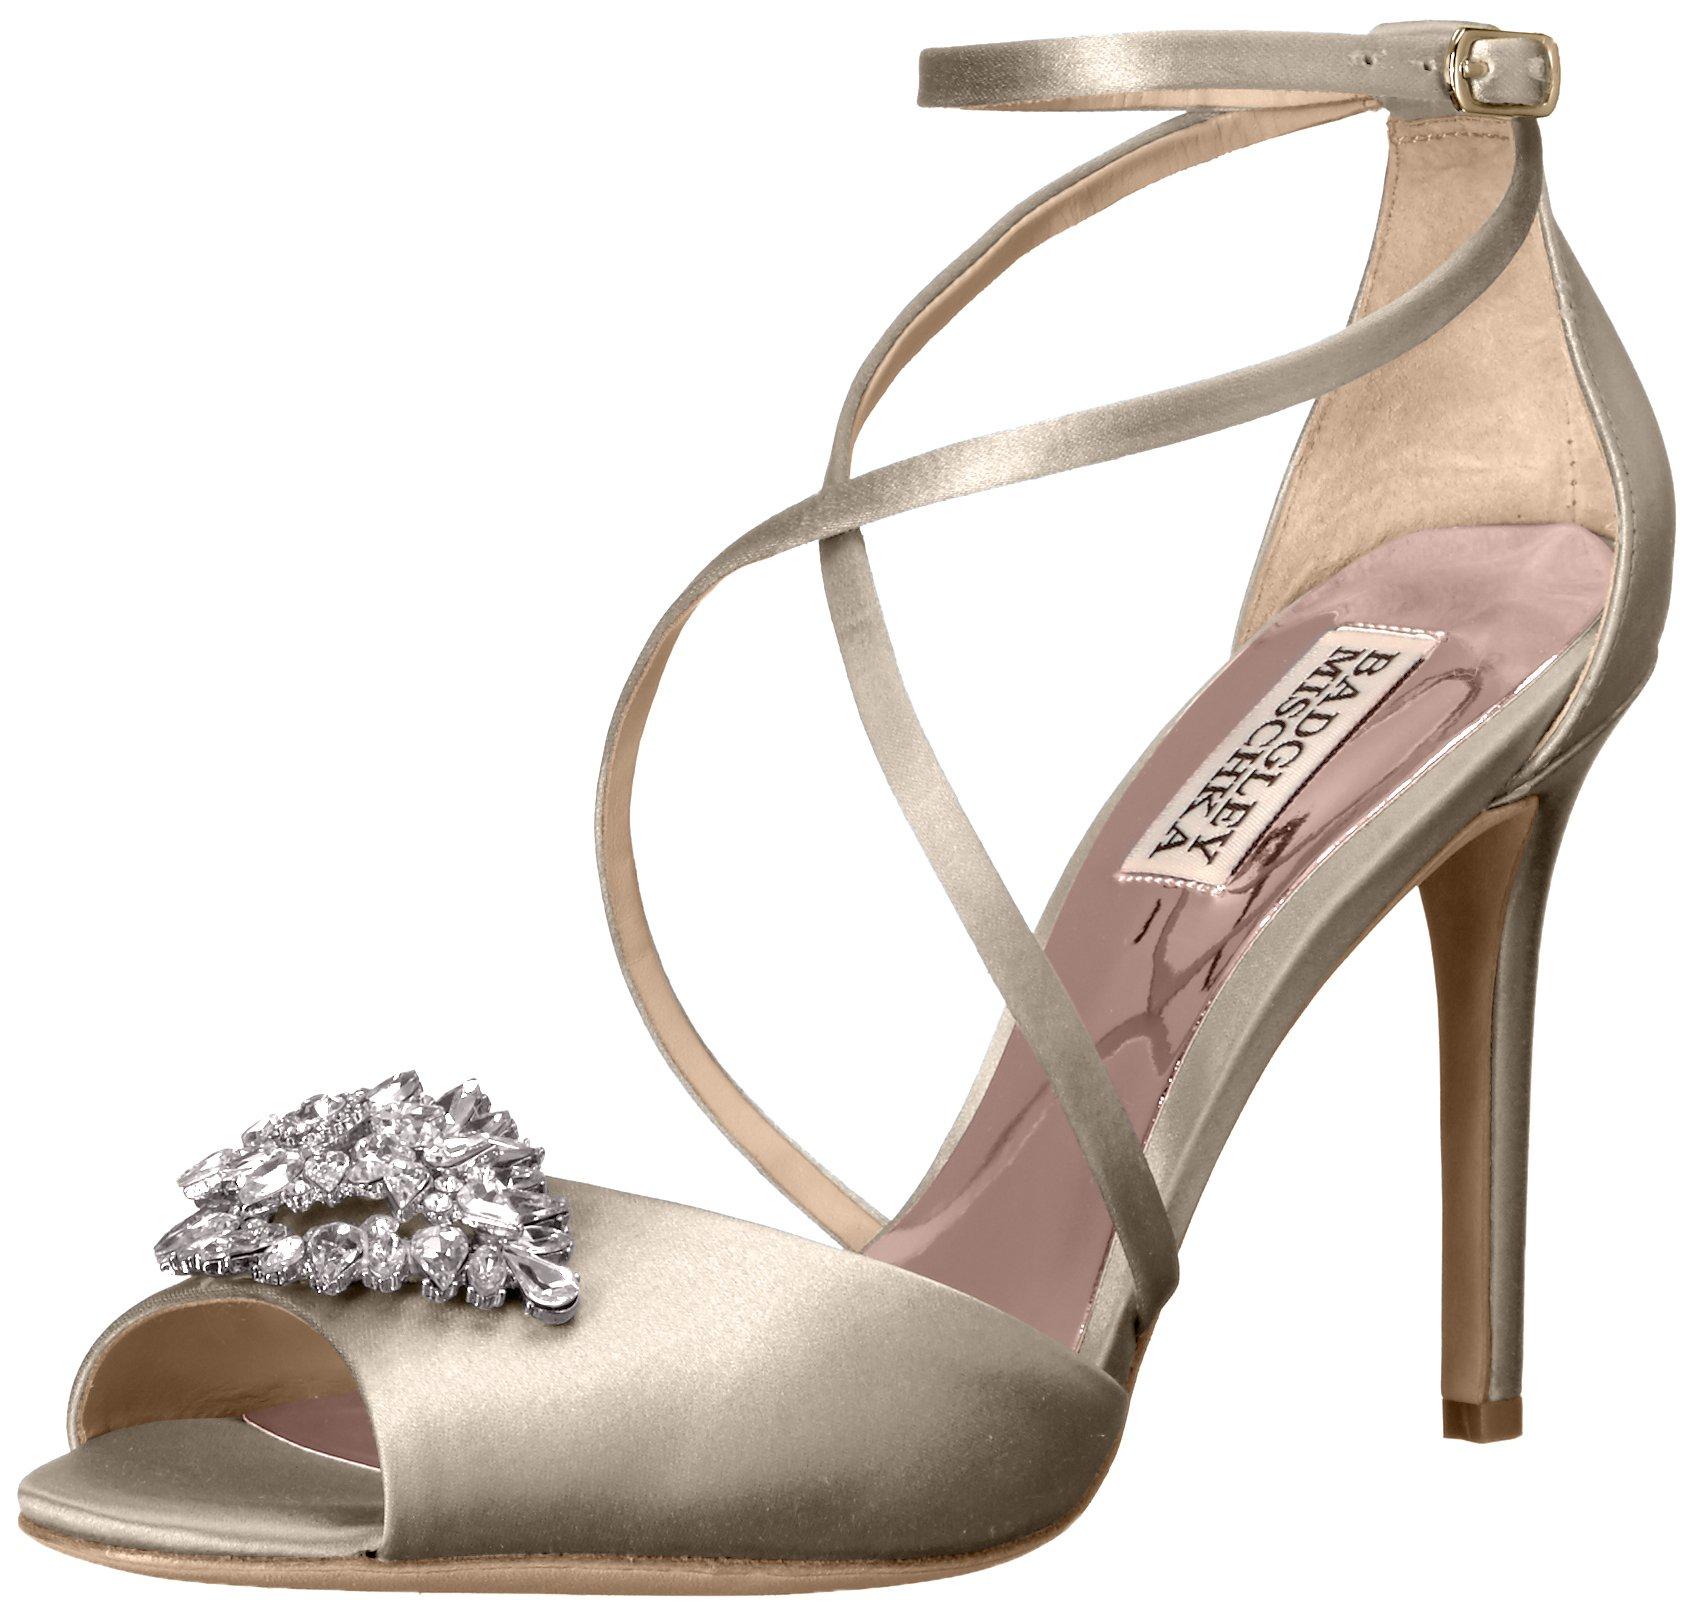 Badgley Mischka Women's Tatum Dress Sandal, Ivory, 7 M US